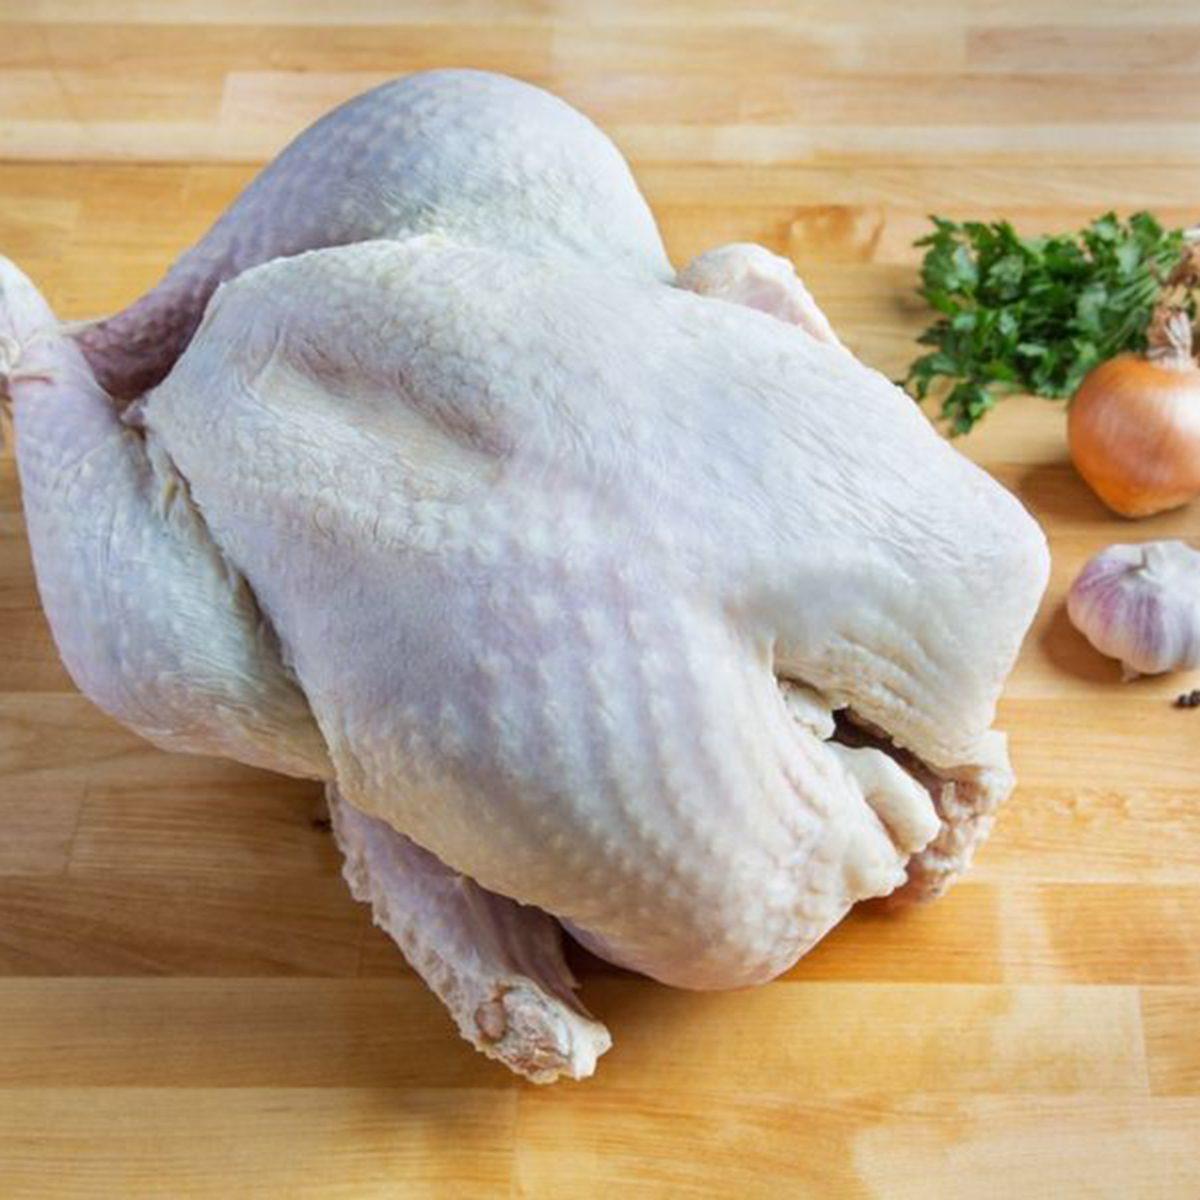 organic, kosher-certified turkeys